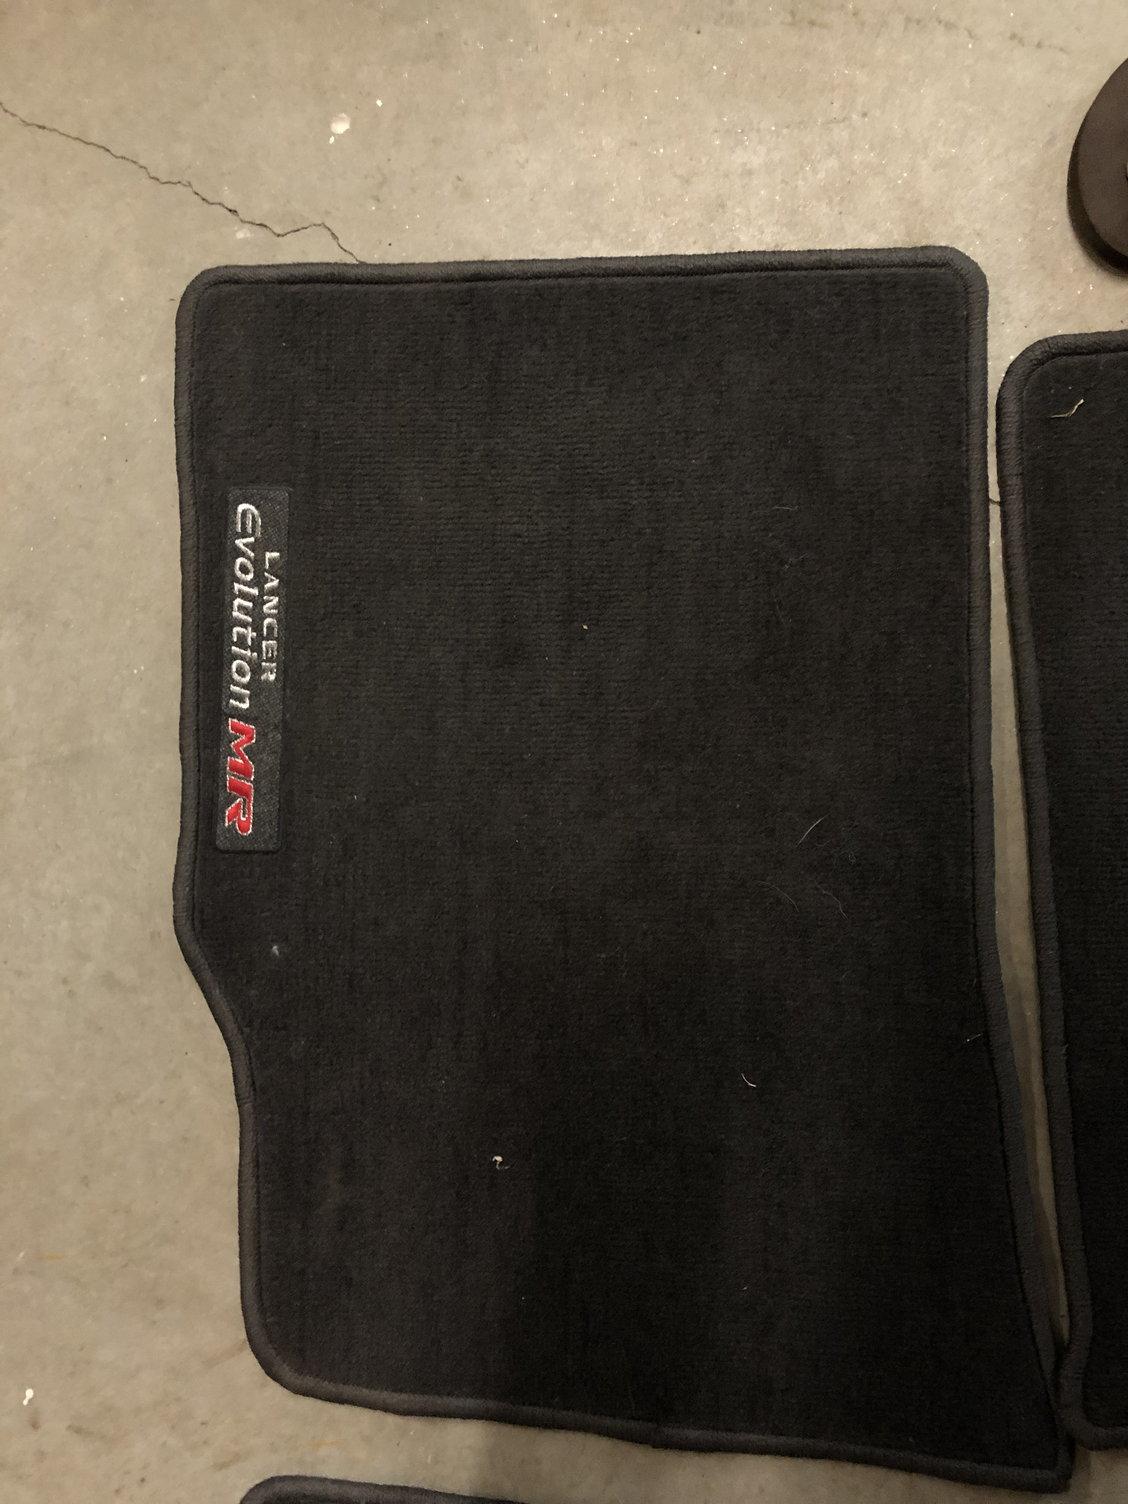 2006 Mitsubishi Lancer Evolution Mr >> Evo 9 MR floor mats - EvolutionM - Mitsubishi Lancer and ...